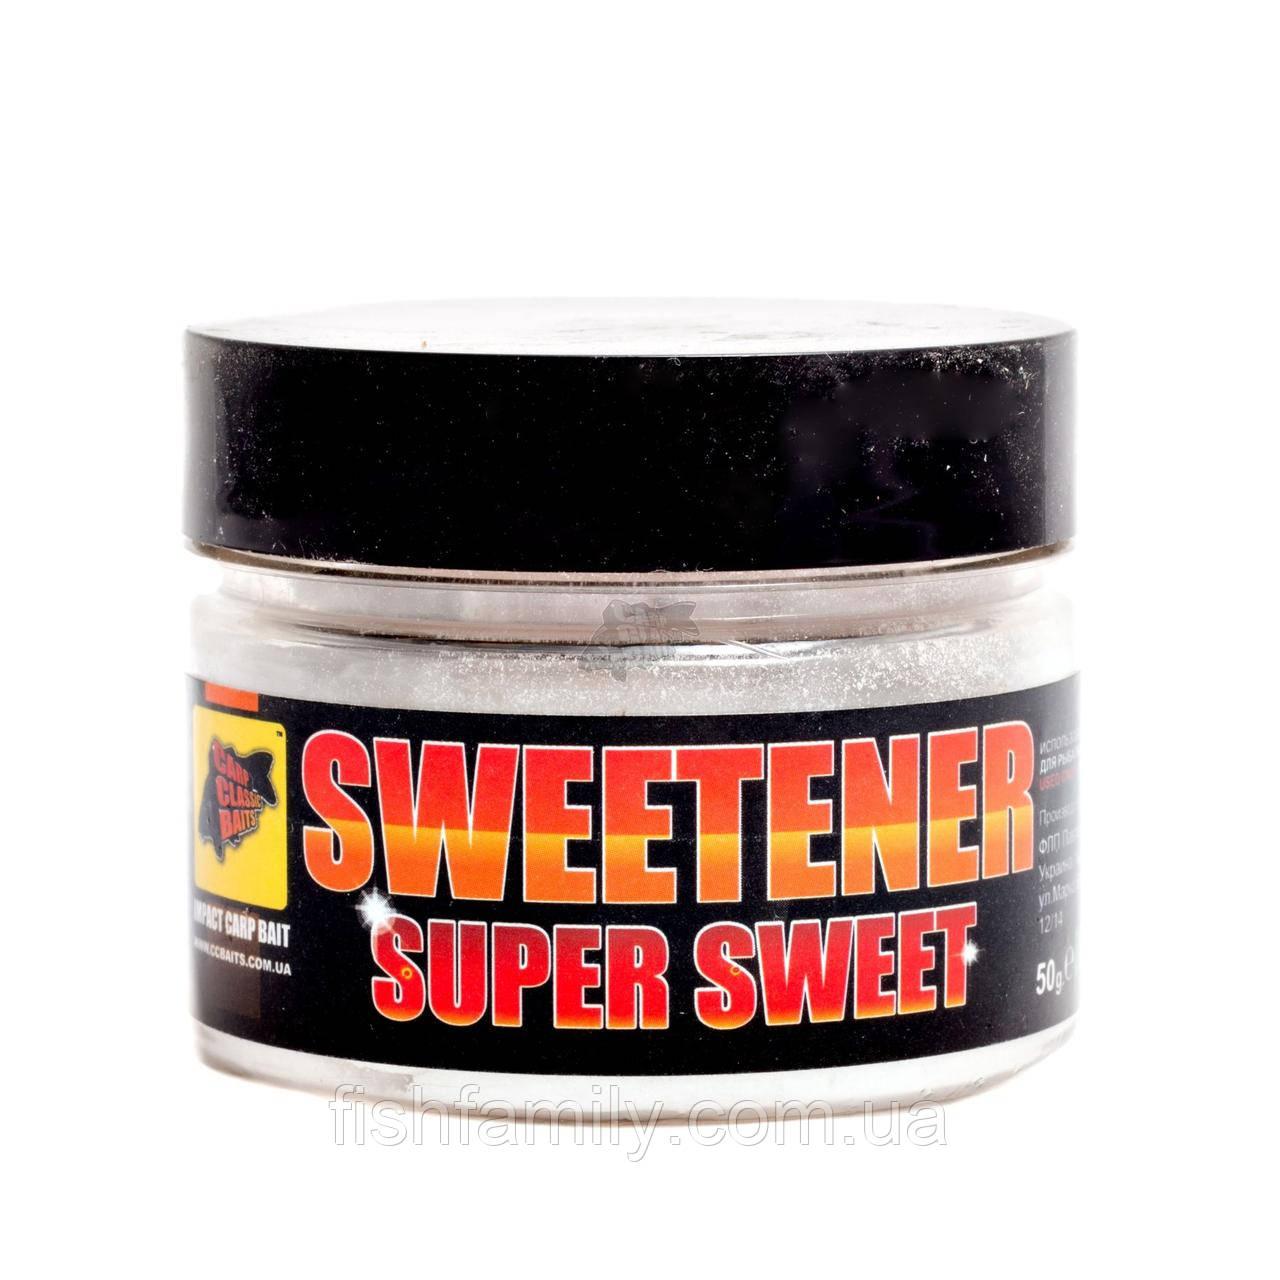 Подсластитель Sweetener Super Sweet, 50гр, 50 гр